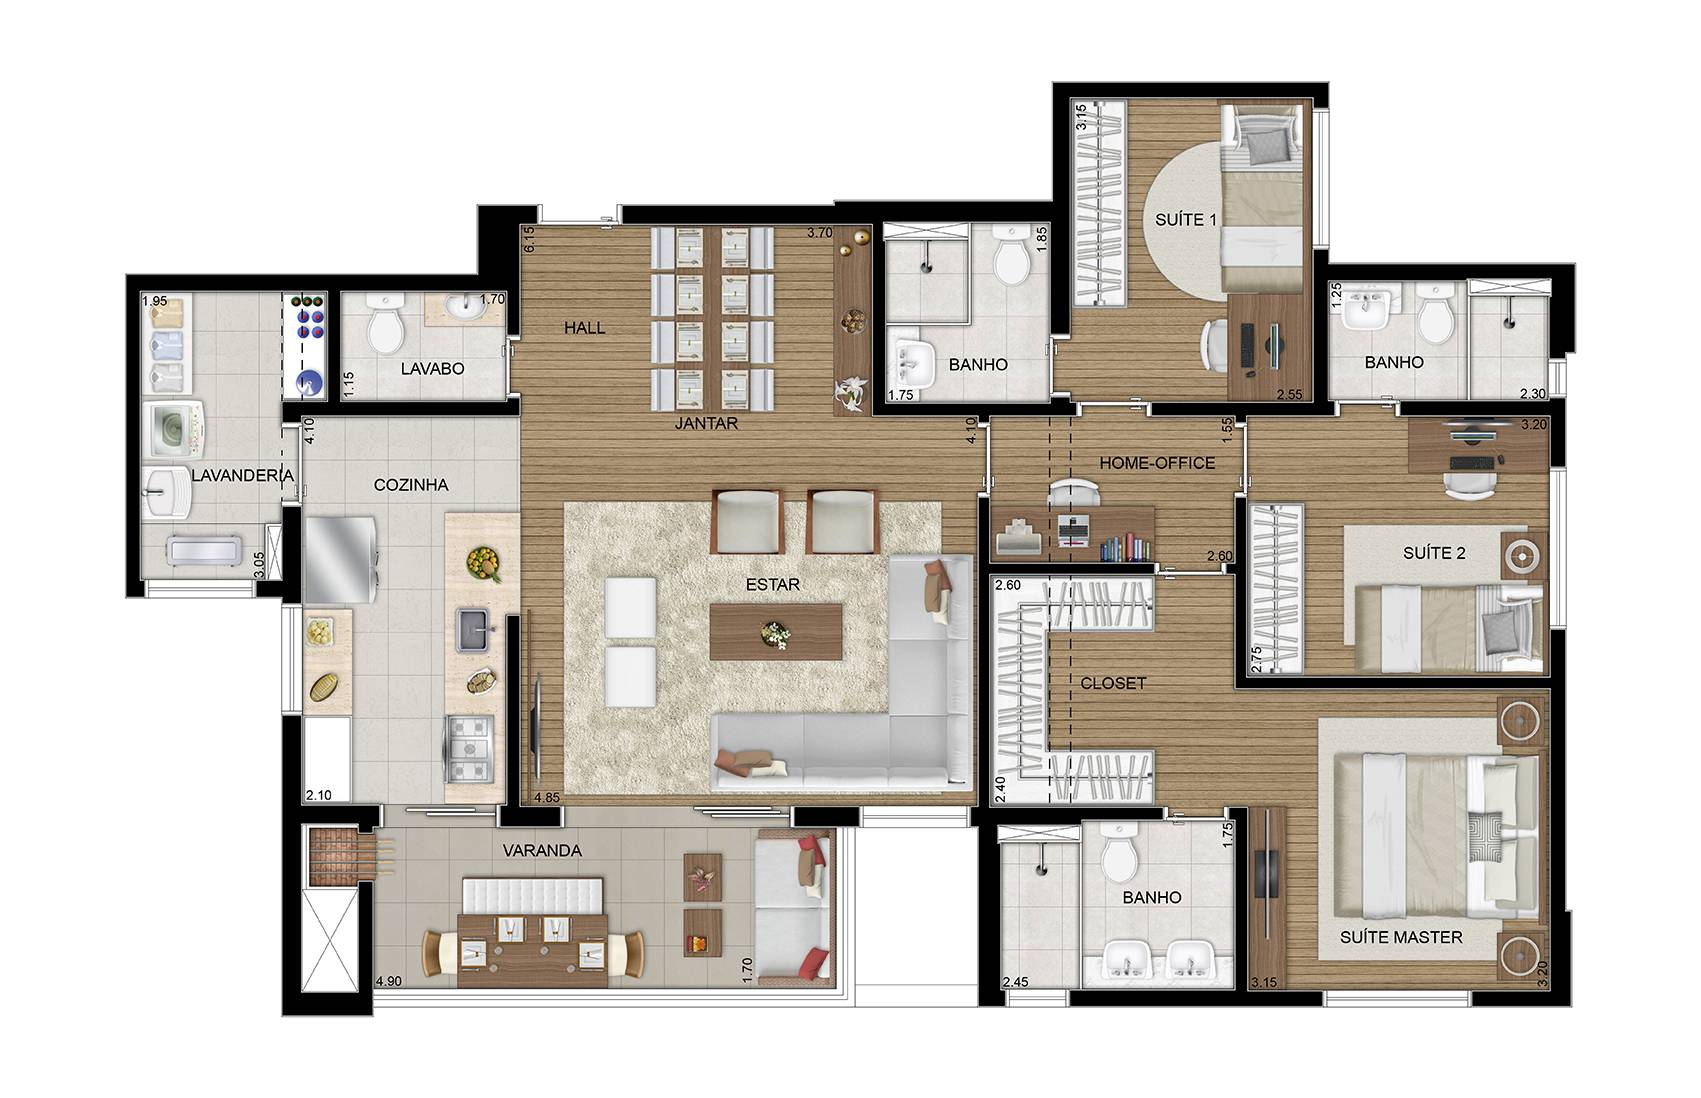 117 m² - 3 suítes - Apto decorado